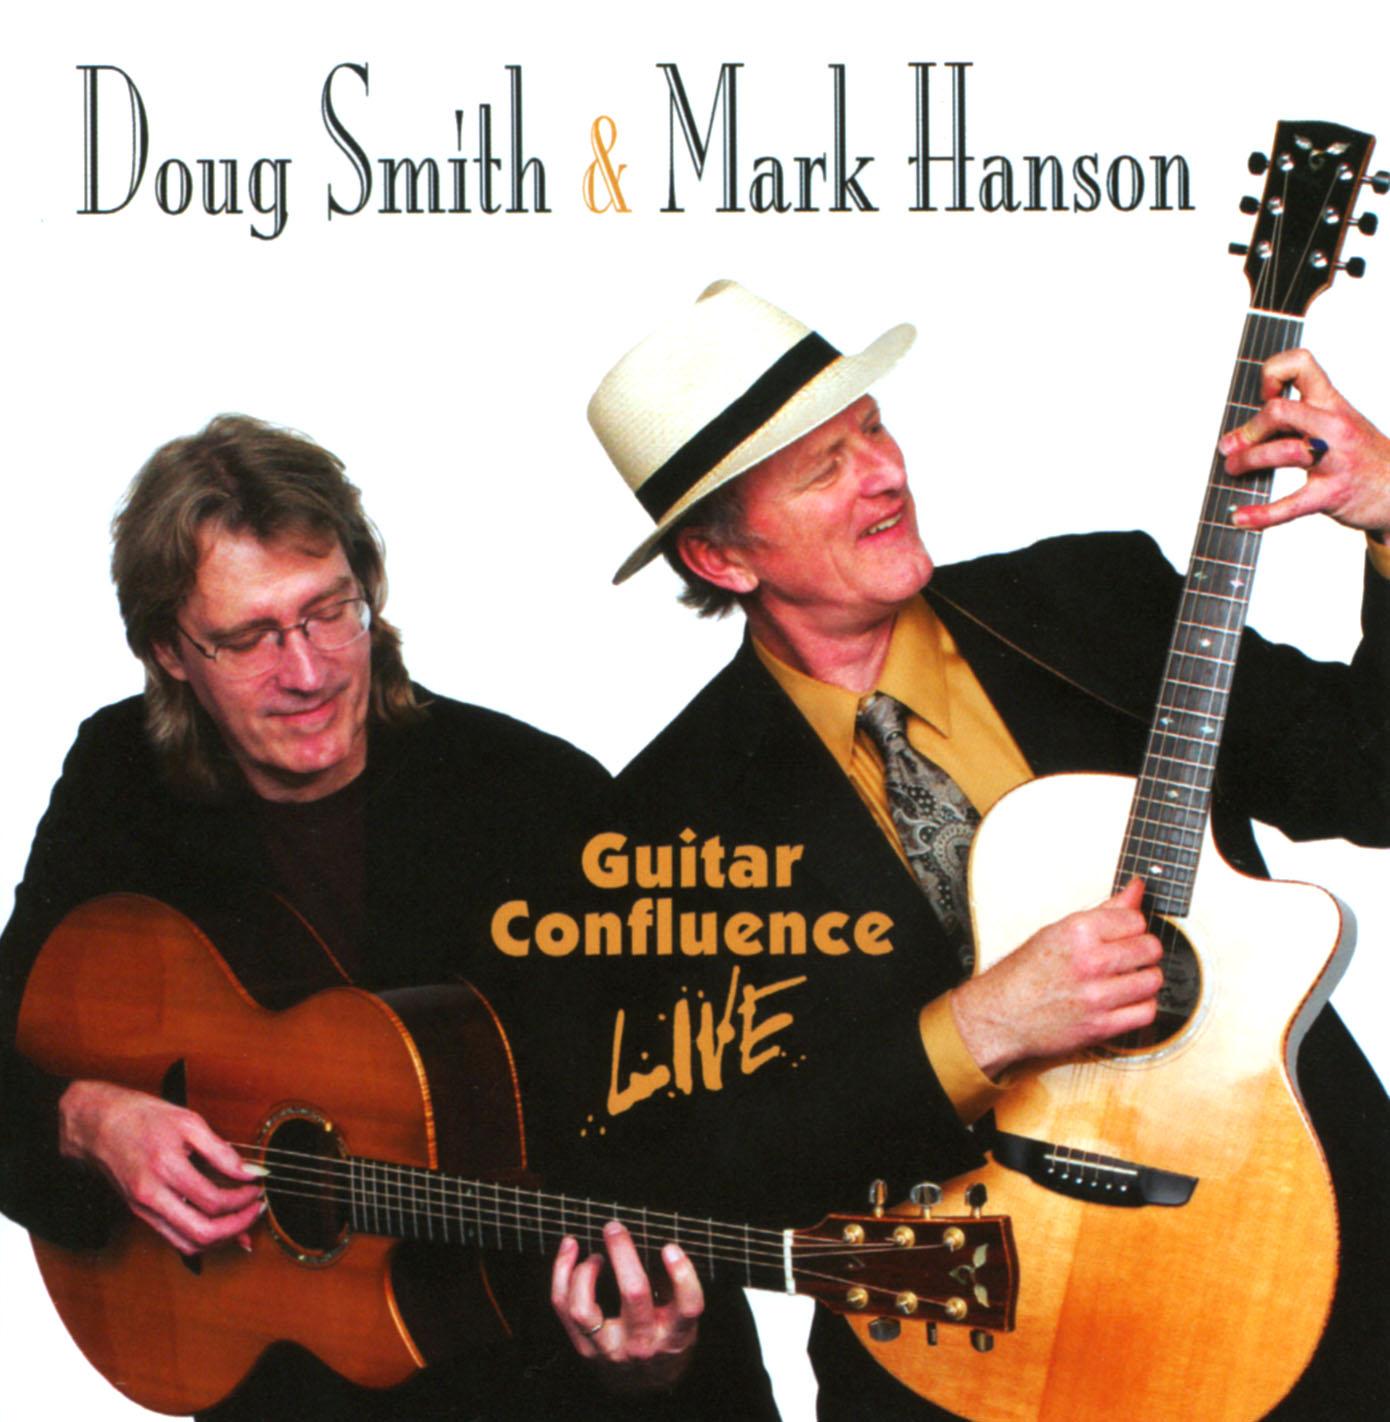 Doug Smith & Mark Hanson: Guitar Confluence Live